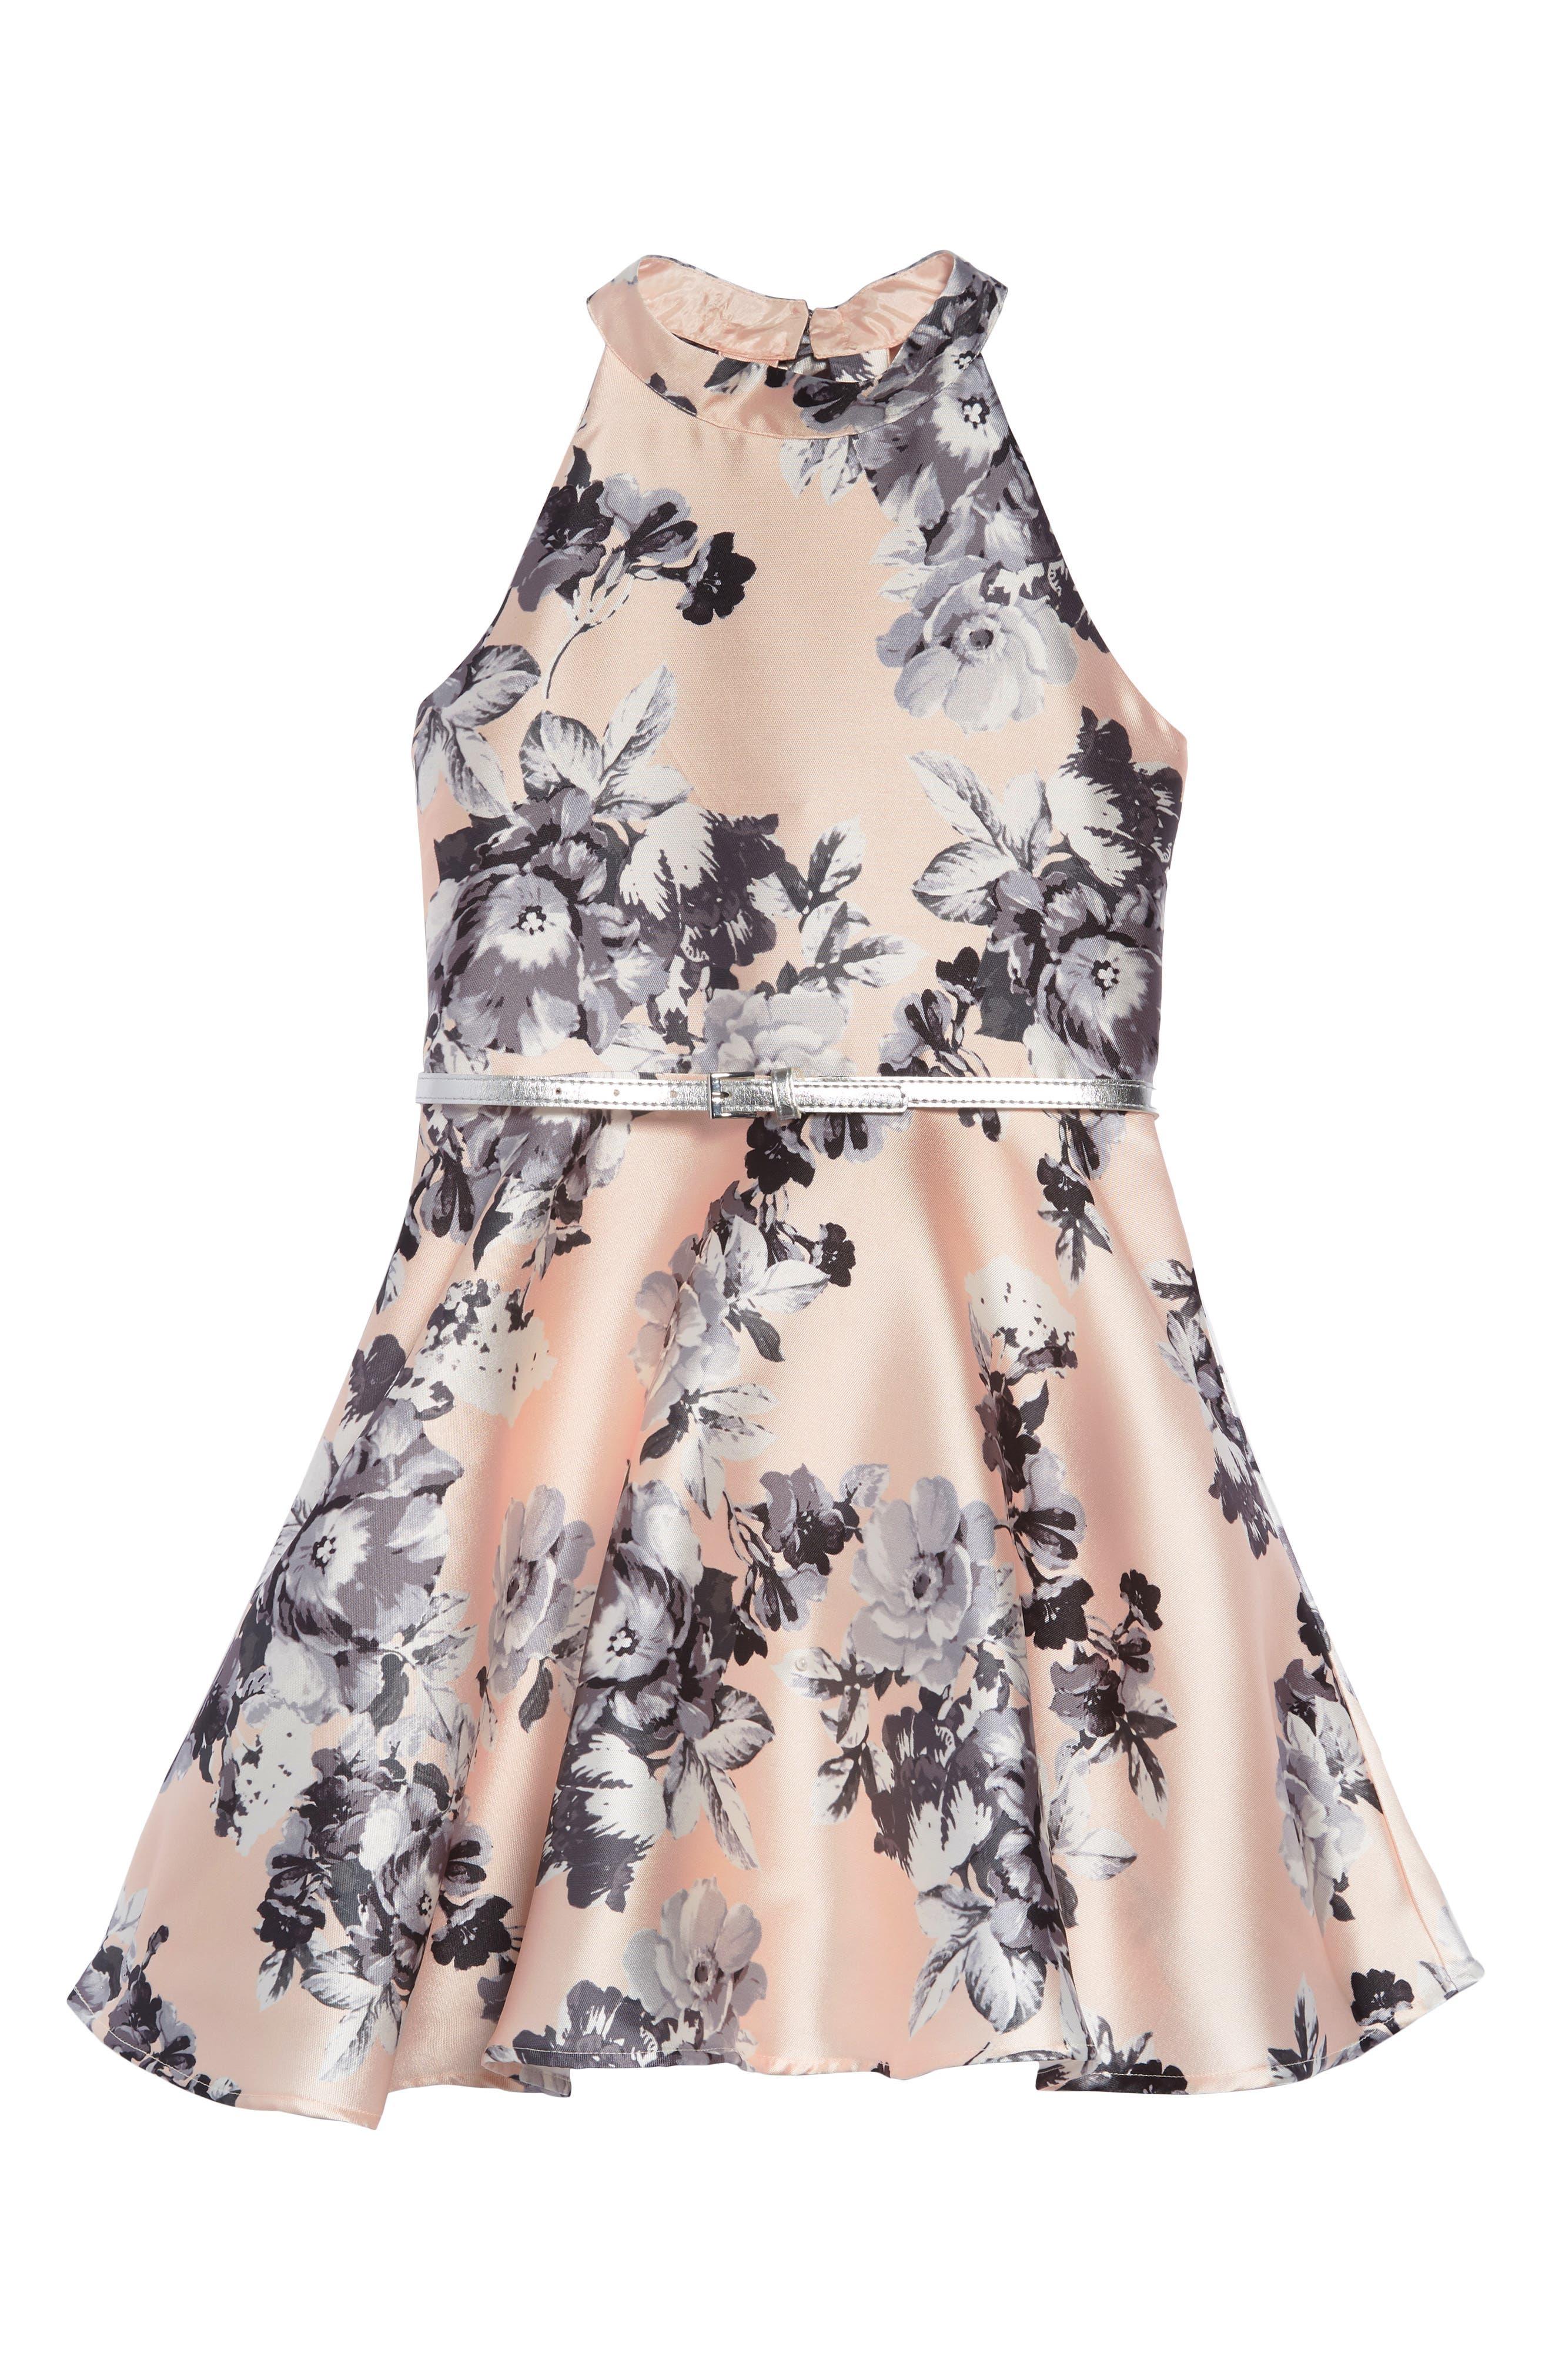 ZUNIE, Floral Fit & Flare Dress, Main thumbnail 1, color, PALE PINK